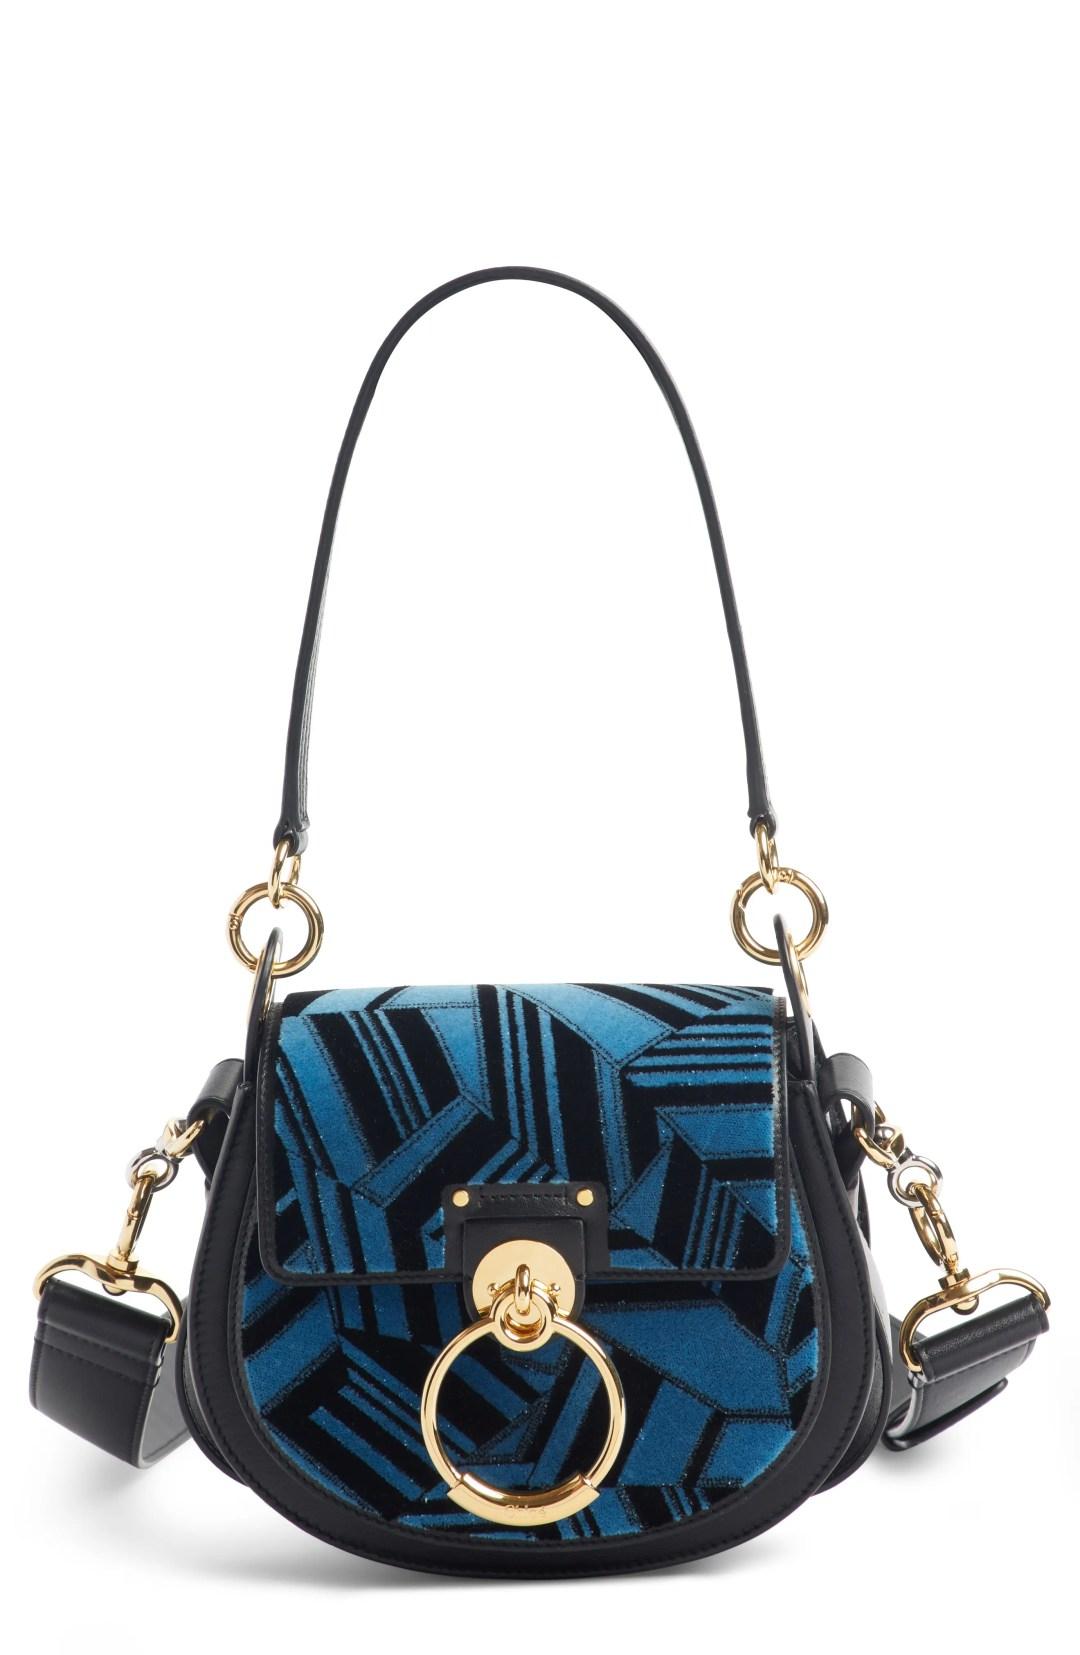 Chloé Small Tess Geo Calfskin Leather Shoulder Bag 8d2da56e291a3